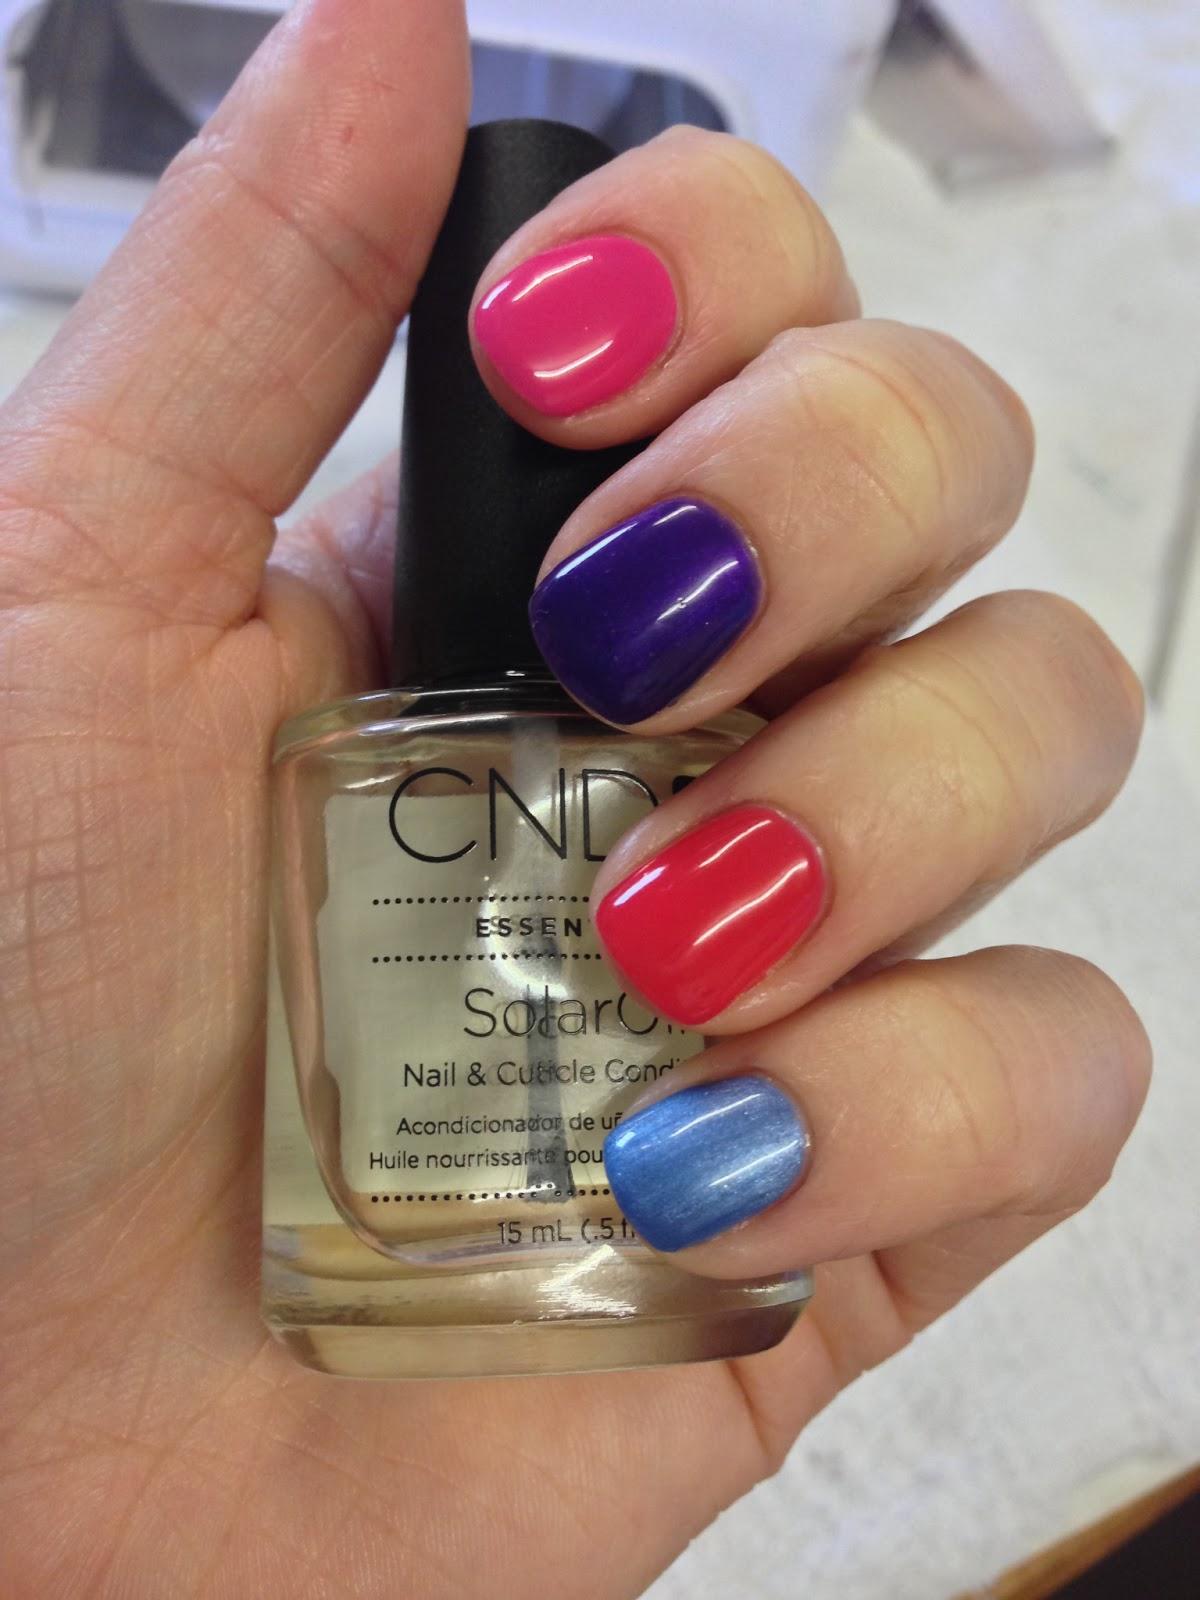 Brush Up And Polish Up!: CND Shellac Summer 2013